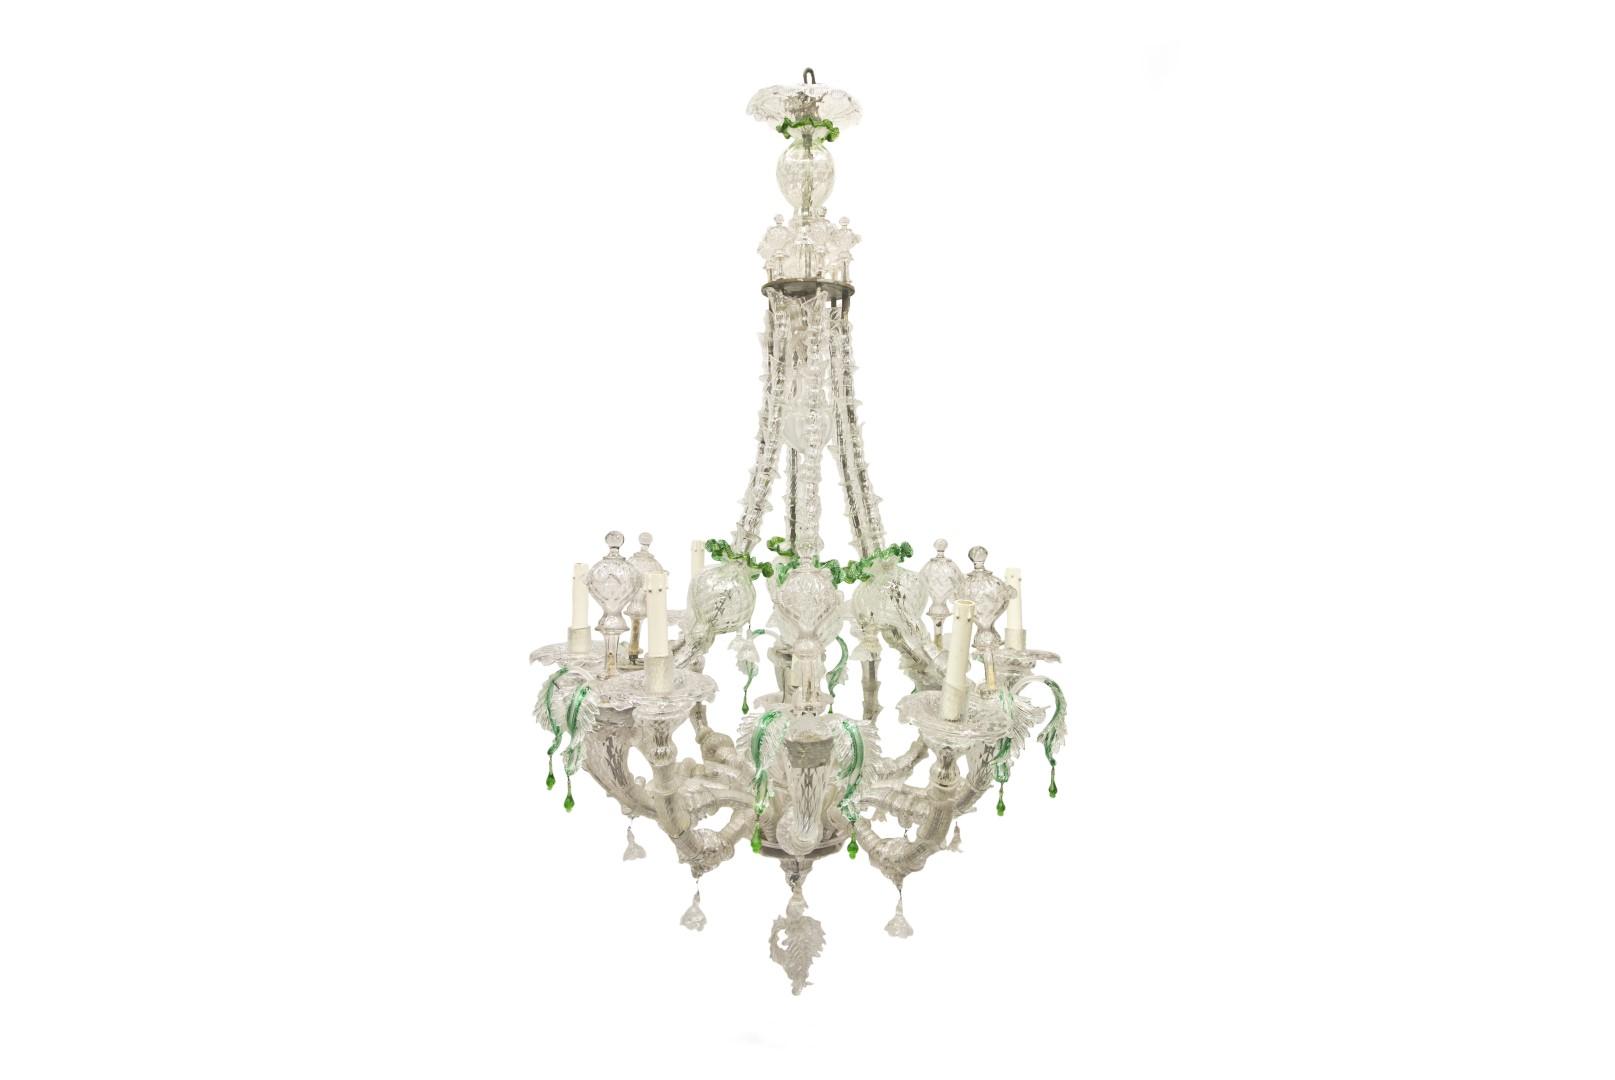 Lampadari antichi in vetro - Albrici Firenze